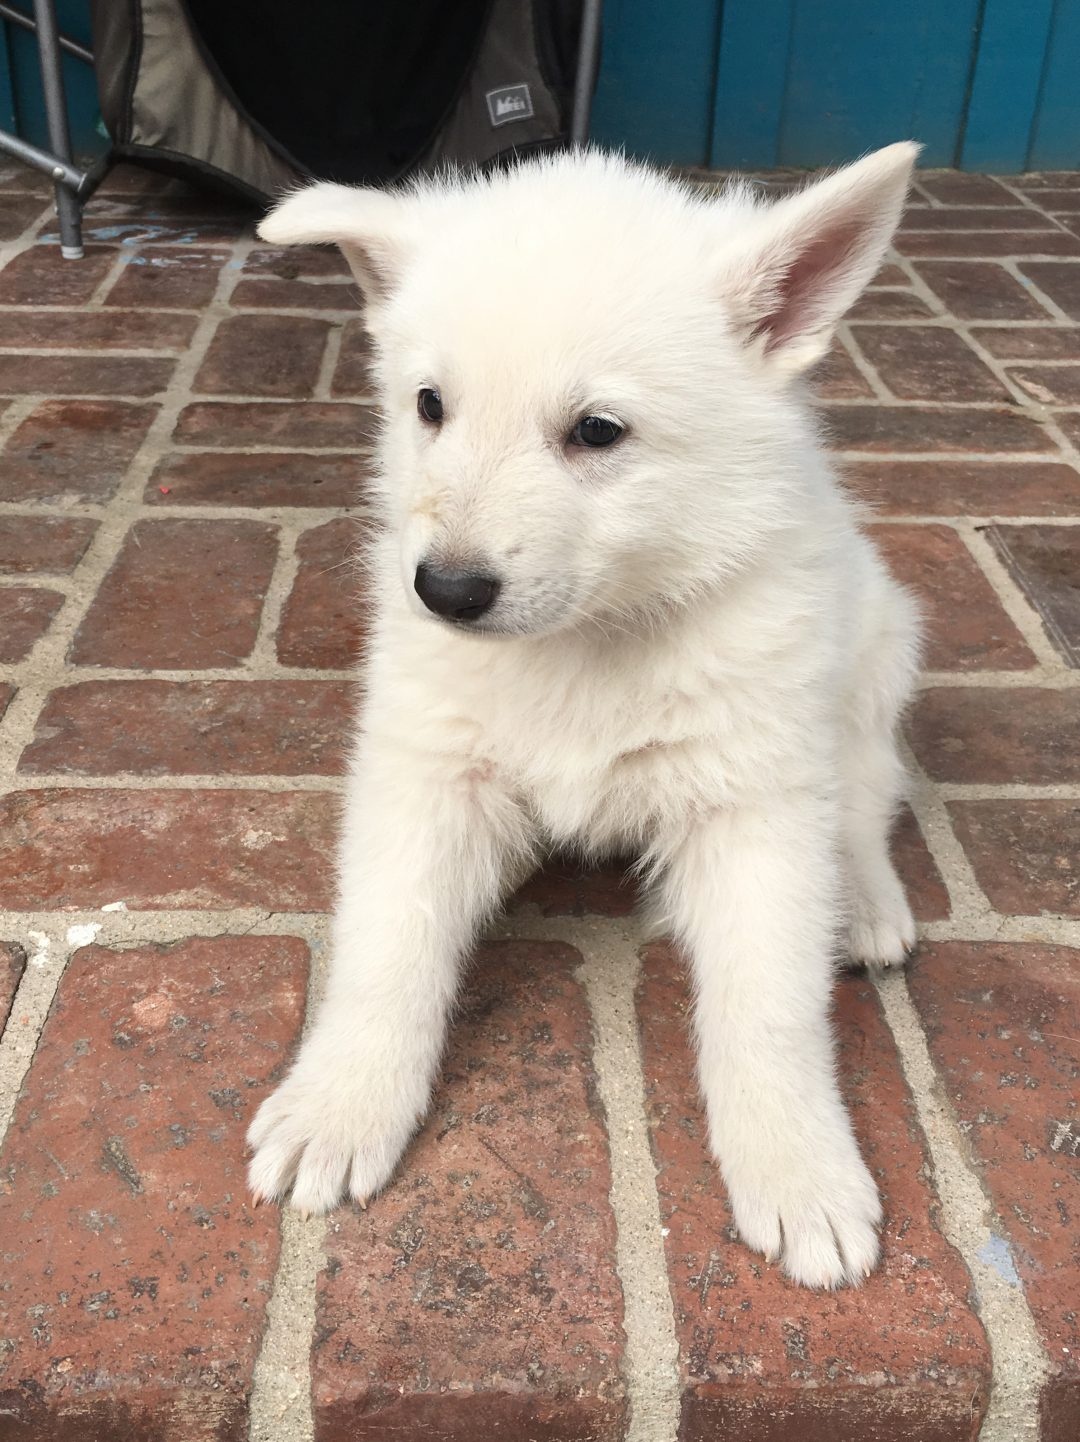 Tan Boy - a male UKC White Shepherd puppy for sale in Fullerton, California